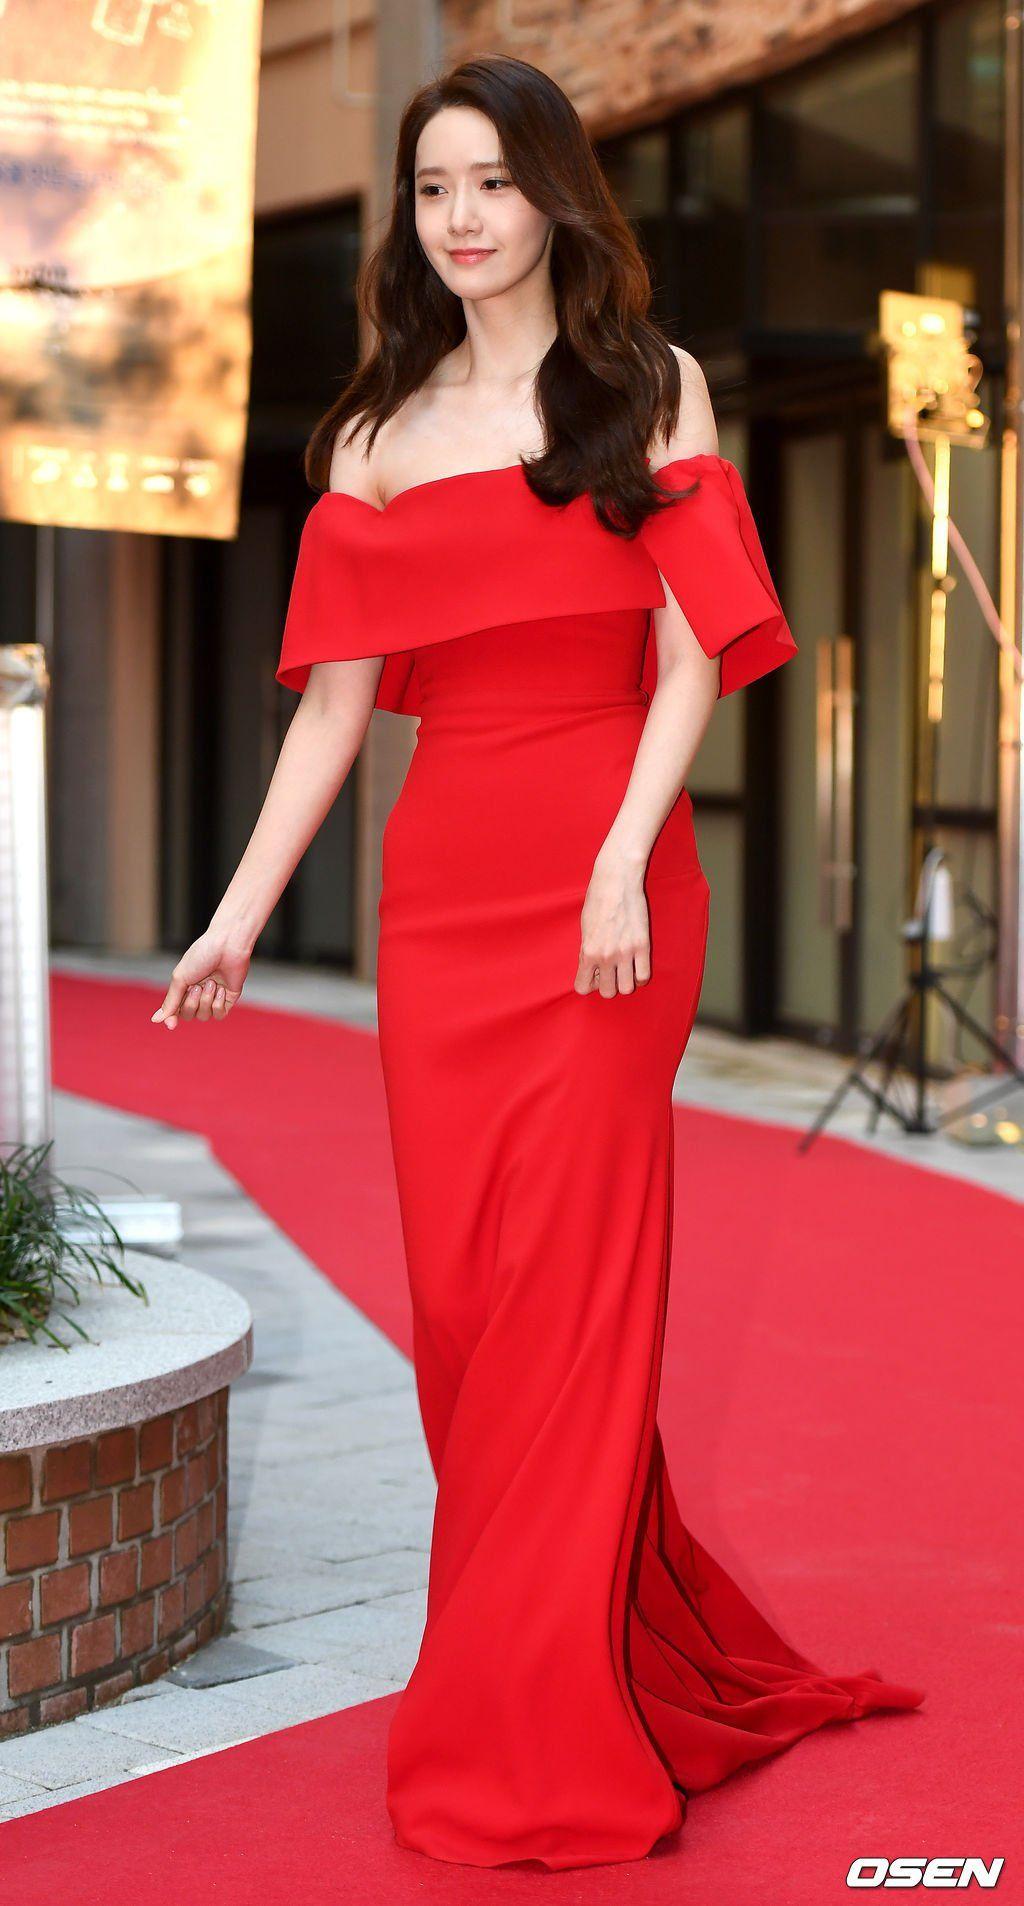 Mystarmyangel on in 2020 Snsd fashion, Yoona, Dresses